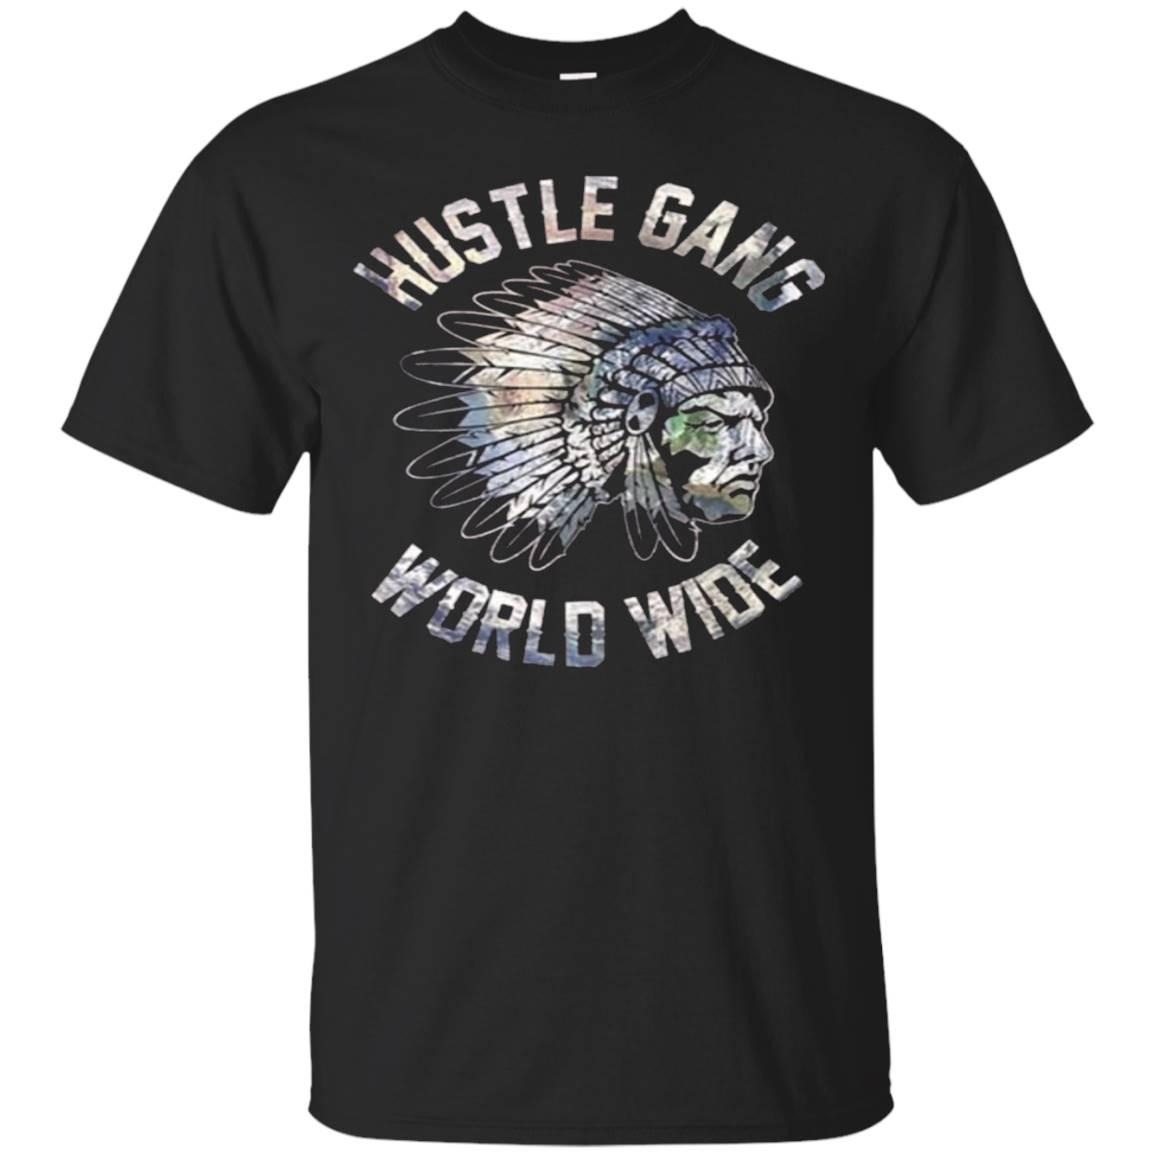 Hustle Gang T Shirt